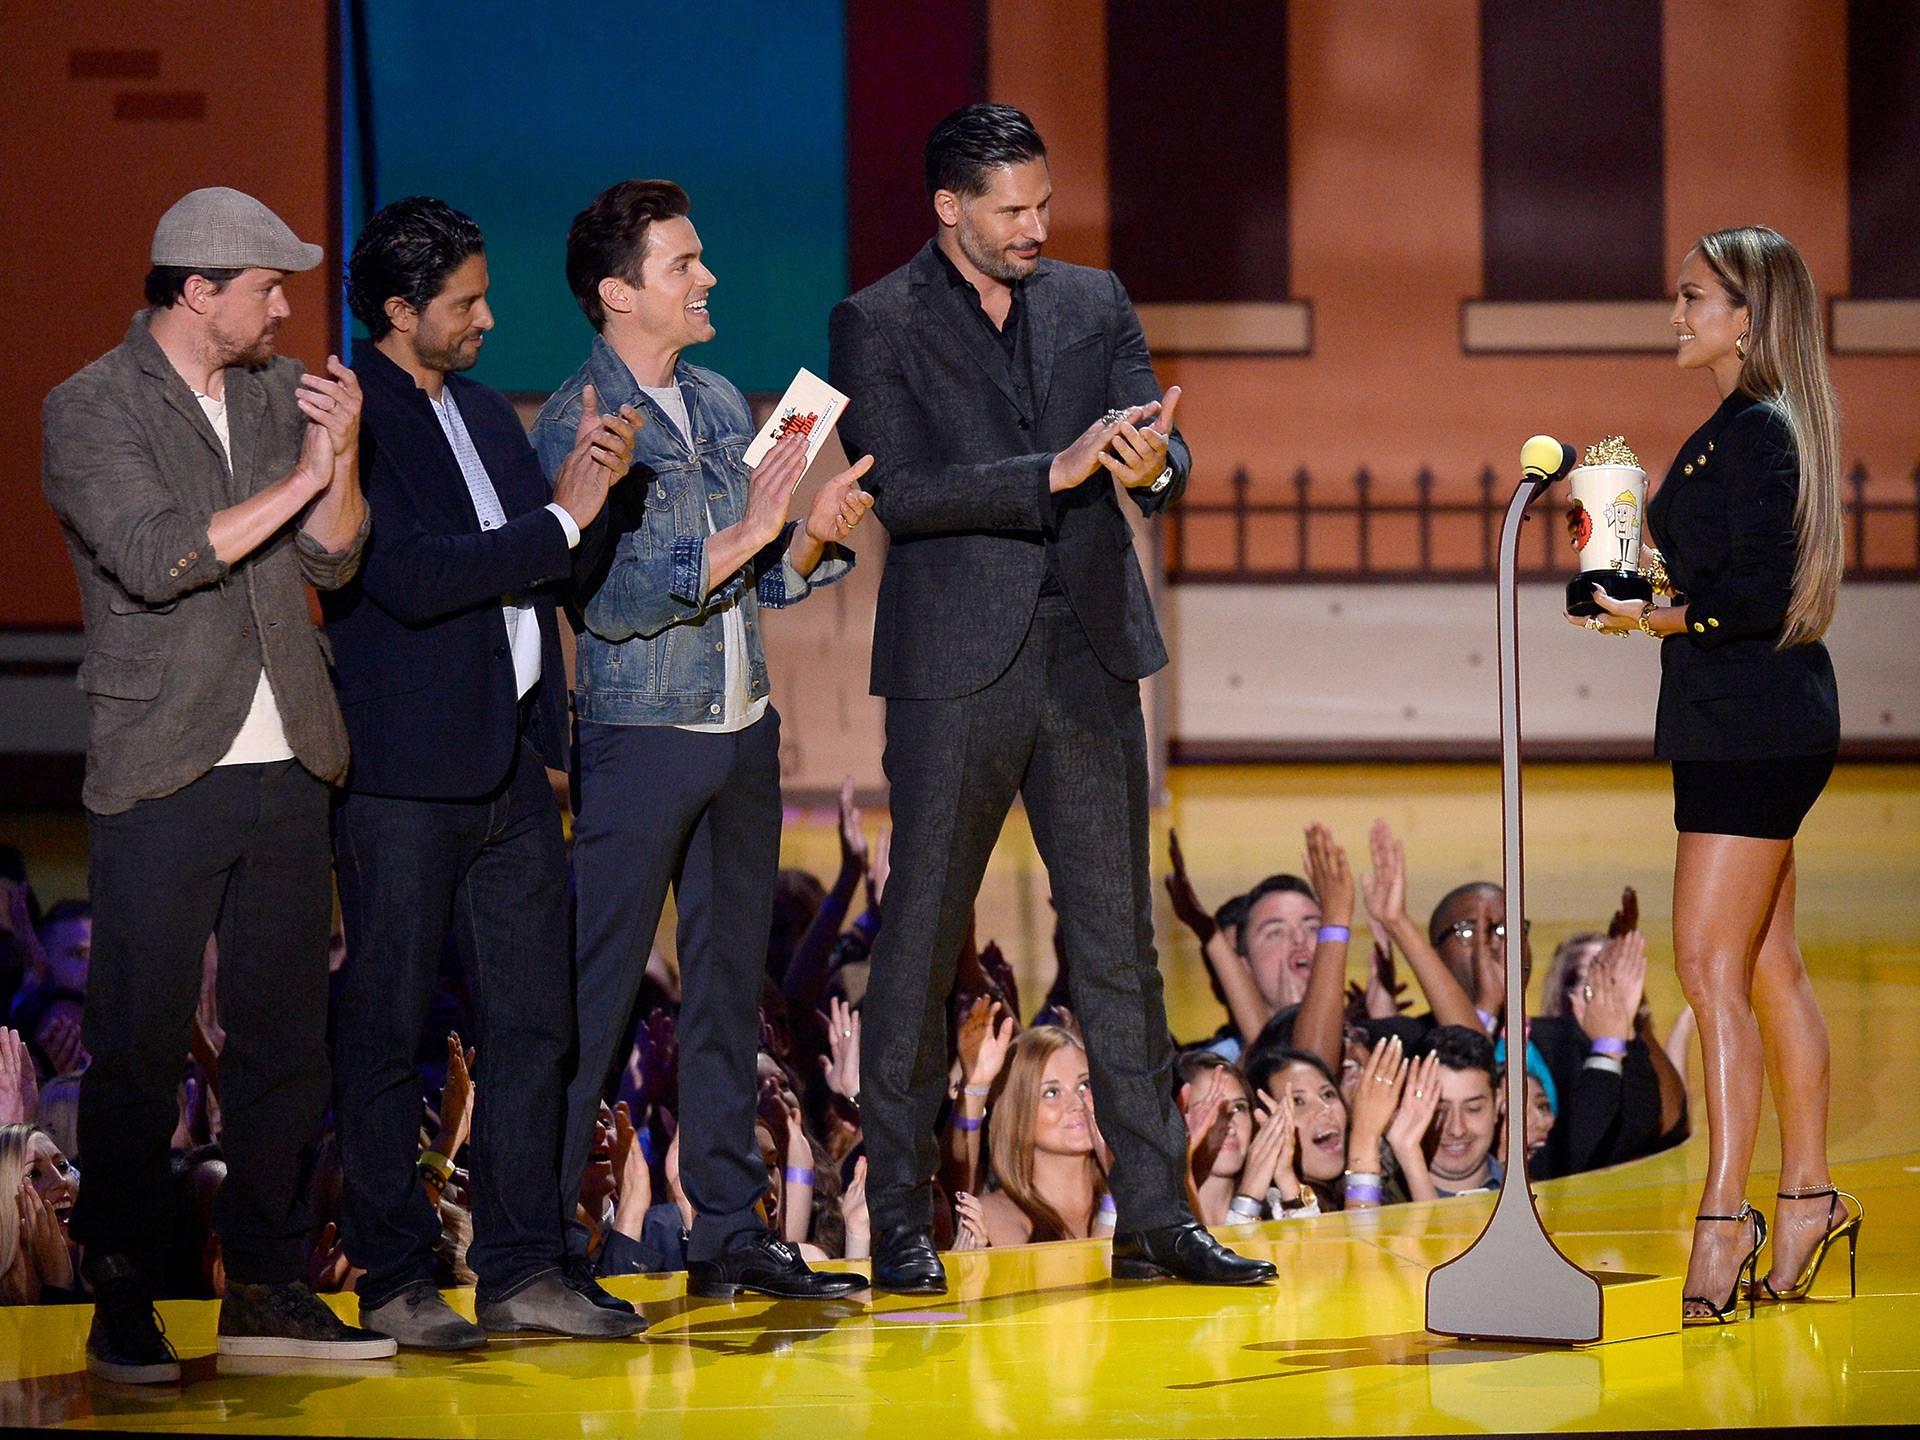 mgid:file:gsp:scenic:/international/mtv-intl/mtv-movie-awards-2015/images/AdamRodriguez-469518514.jpg